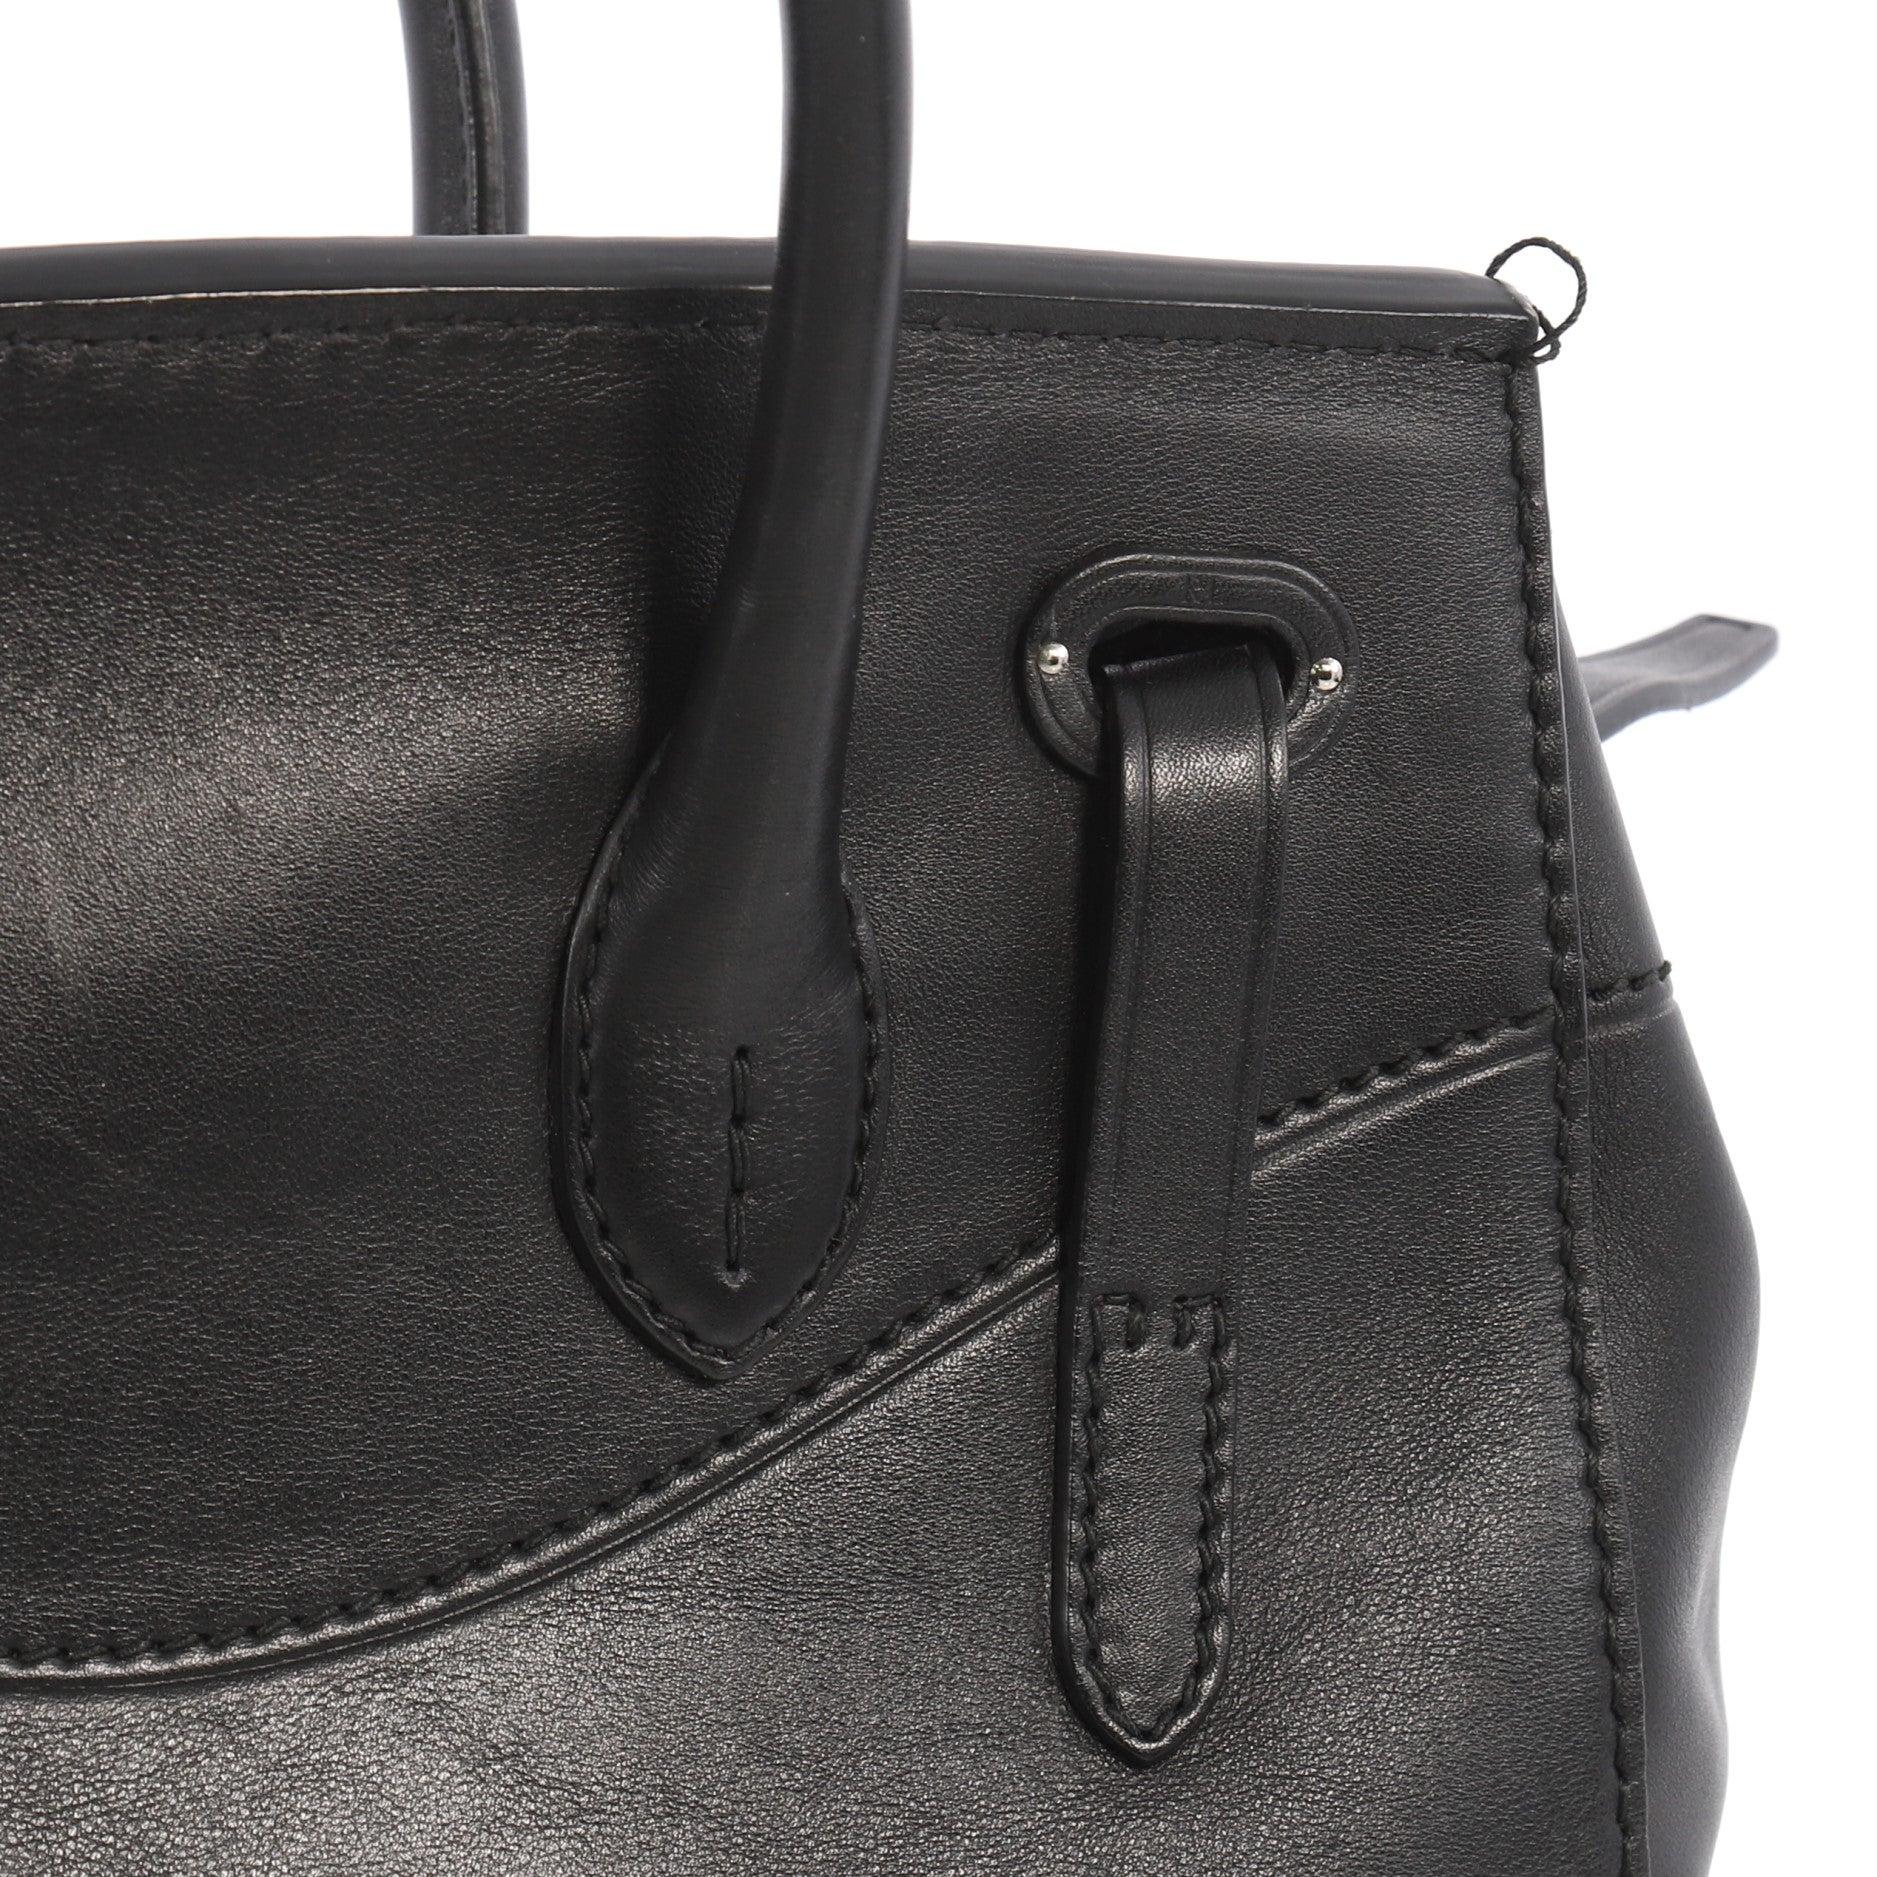 96ac12ebfad8 Ralph lauren collection soft ricky handbag leather at stdibs jpg 1877x1877  Soft leather tote ralph lauren